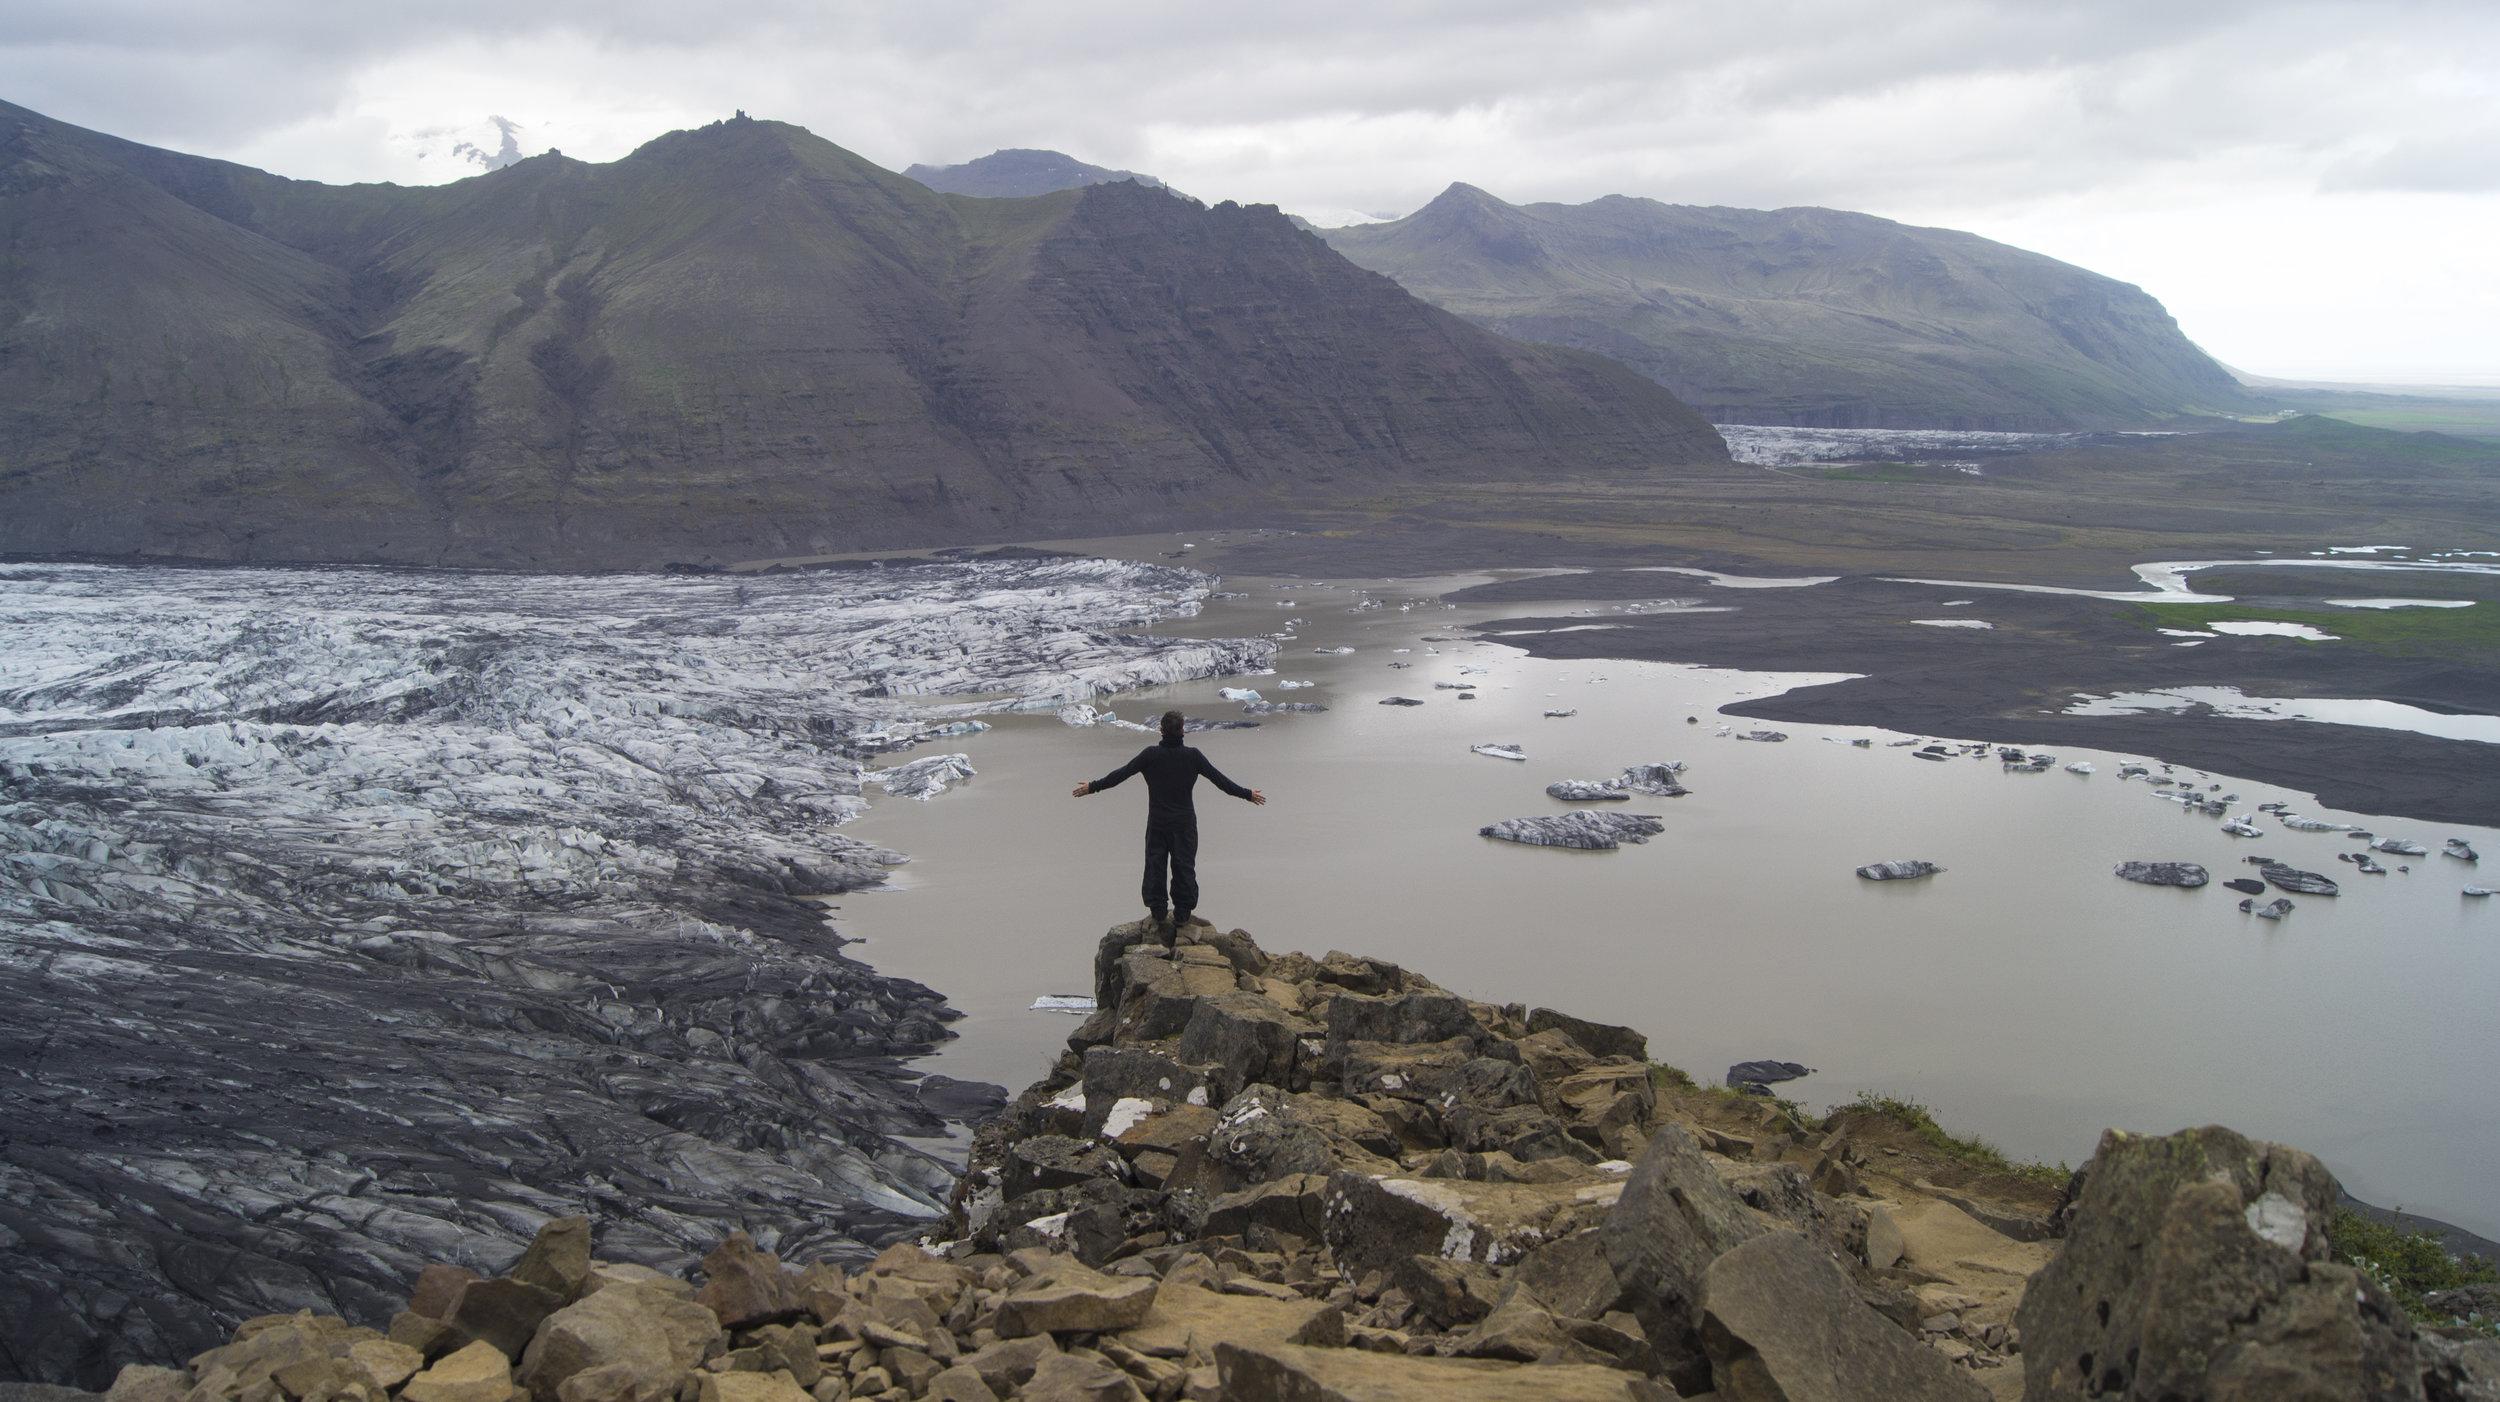 Vatnajökull GLACIER, ICELAND                                                                                                  PHOTOGRAPHY: @DYLANMOREHEAD